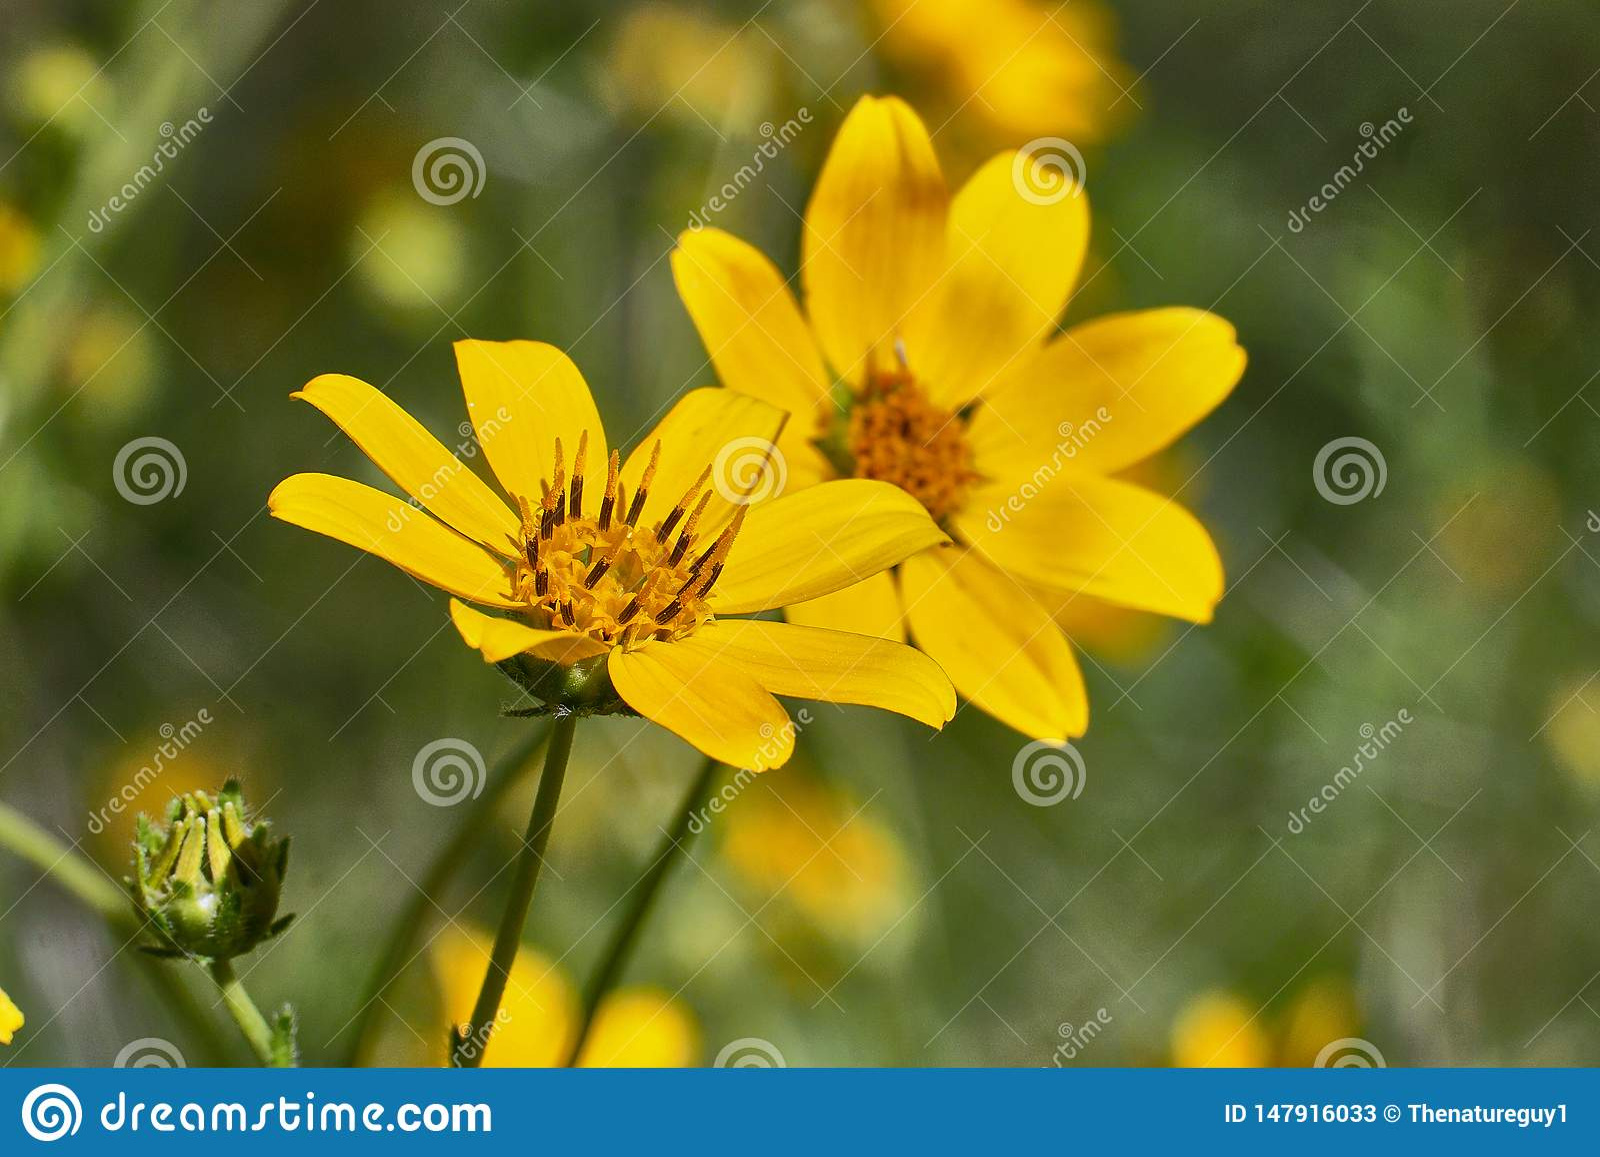 Daisy Flower de Engelmann Texas Wildflowers